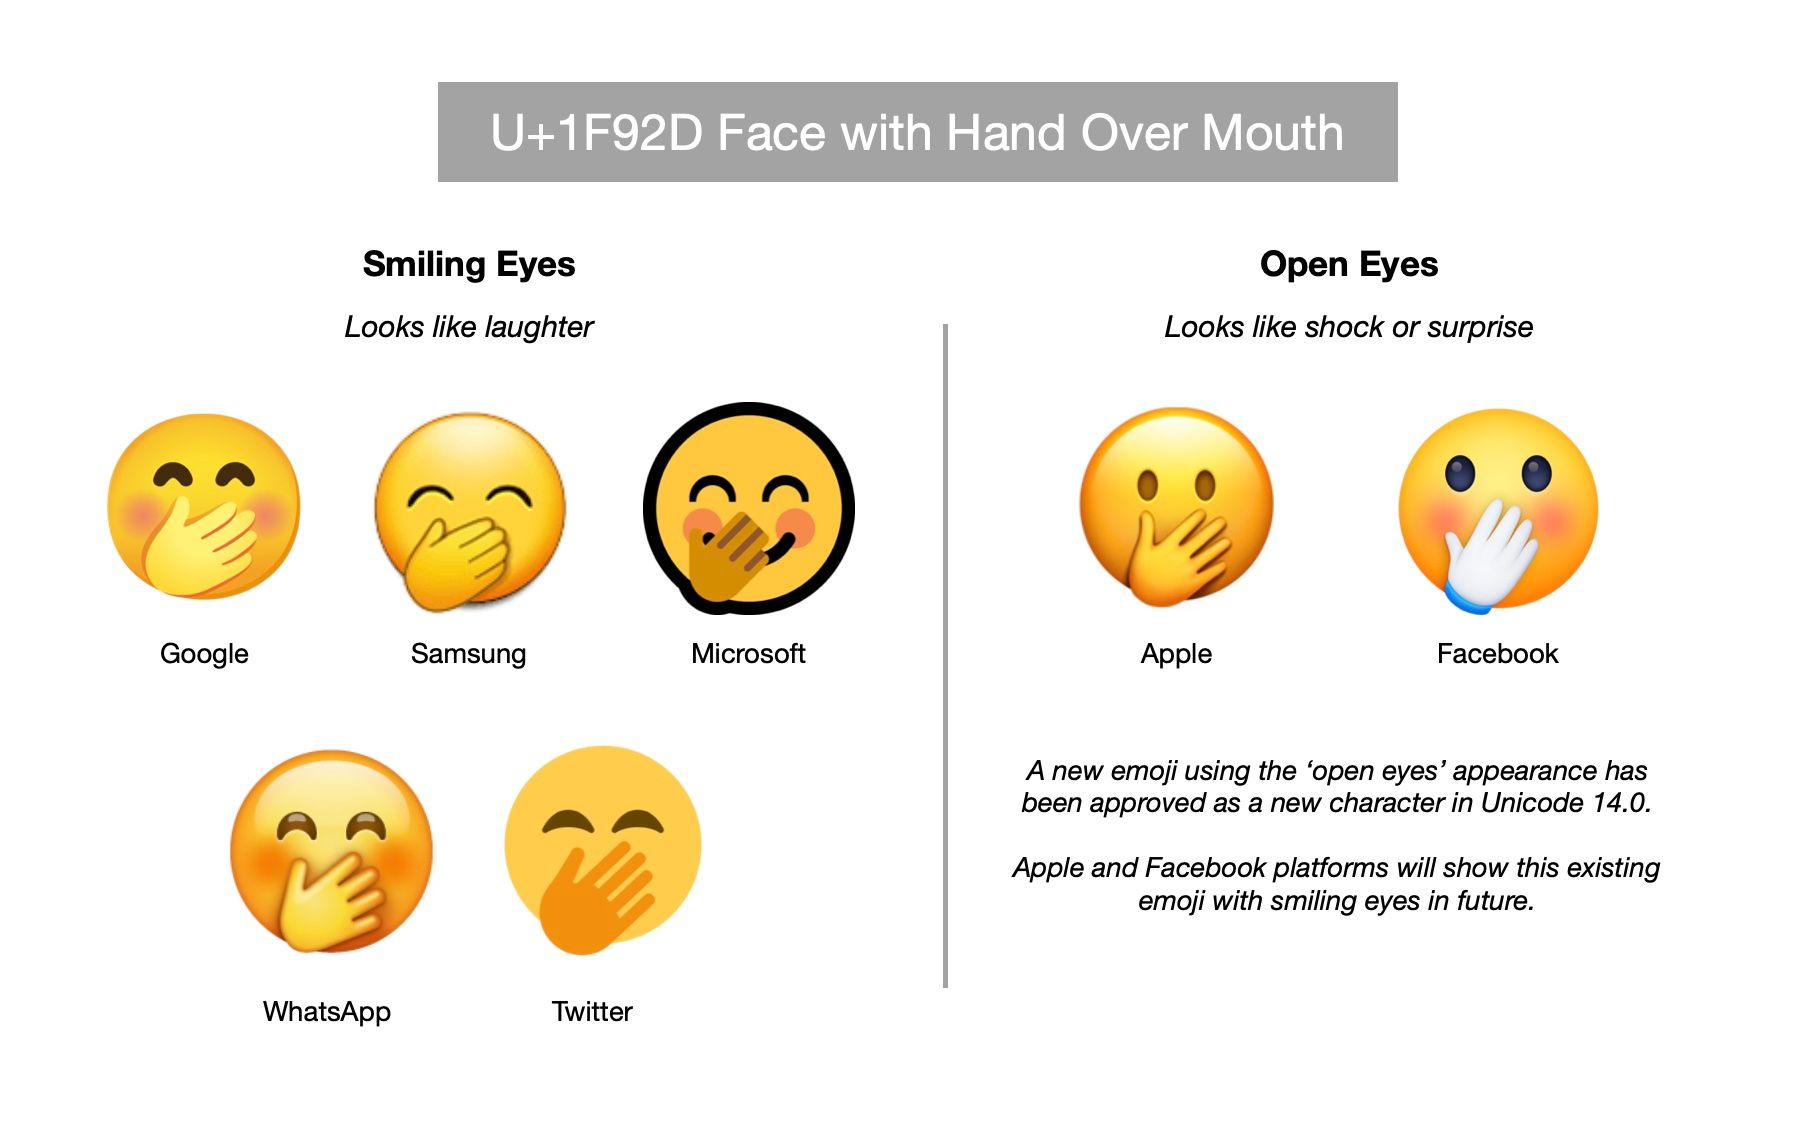 hand-over-mouth-emojipedia-emoji-14-0